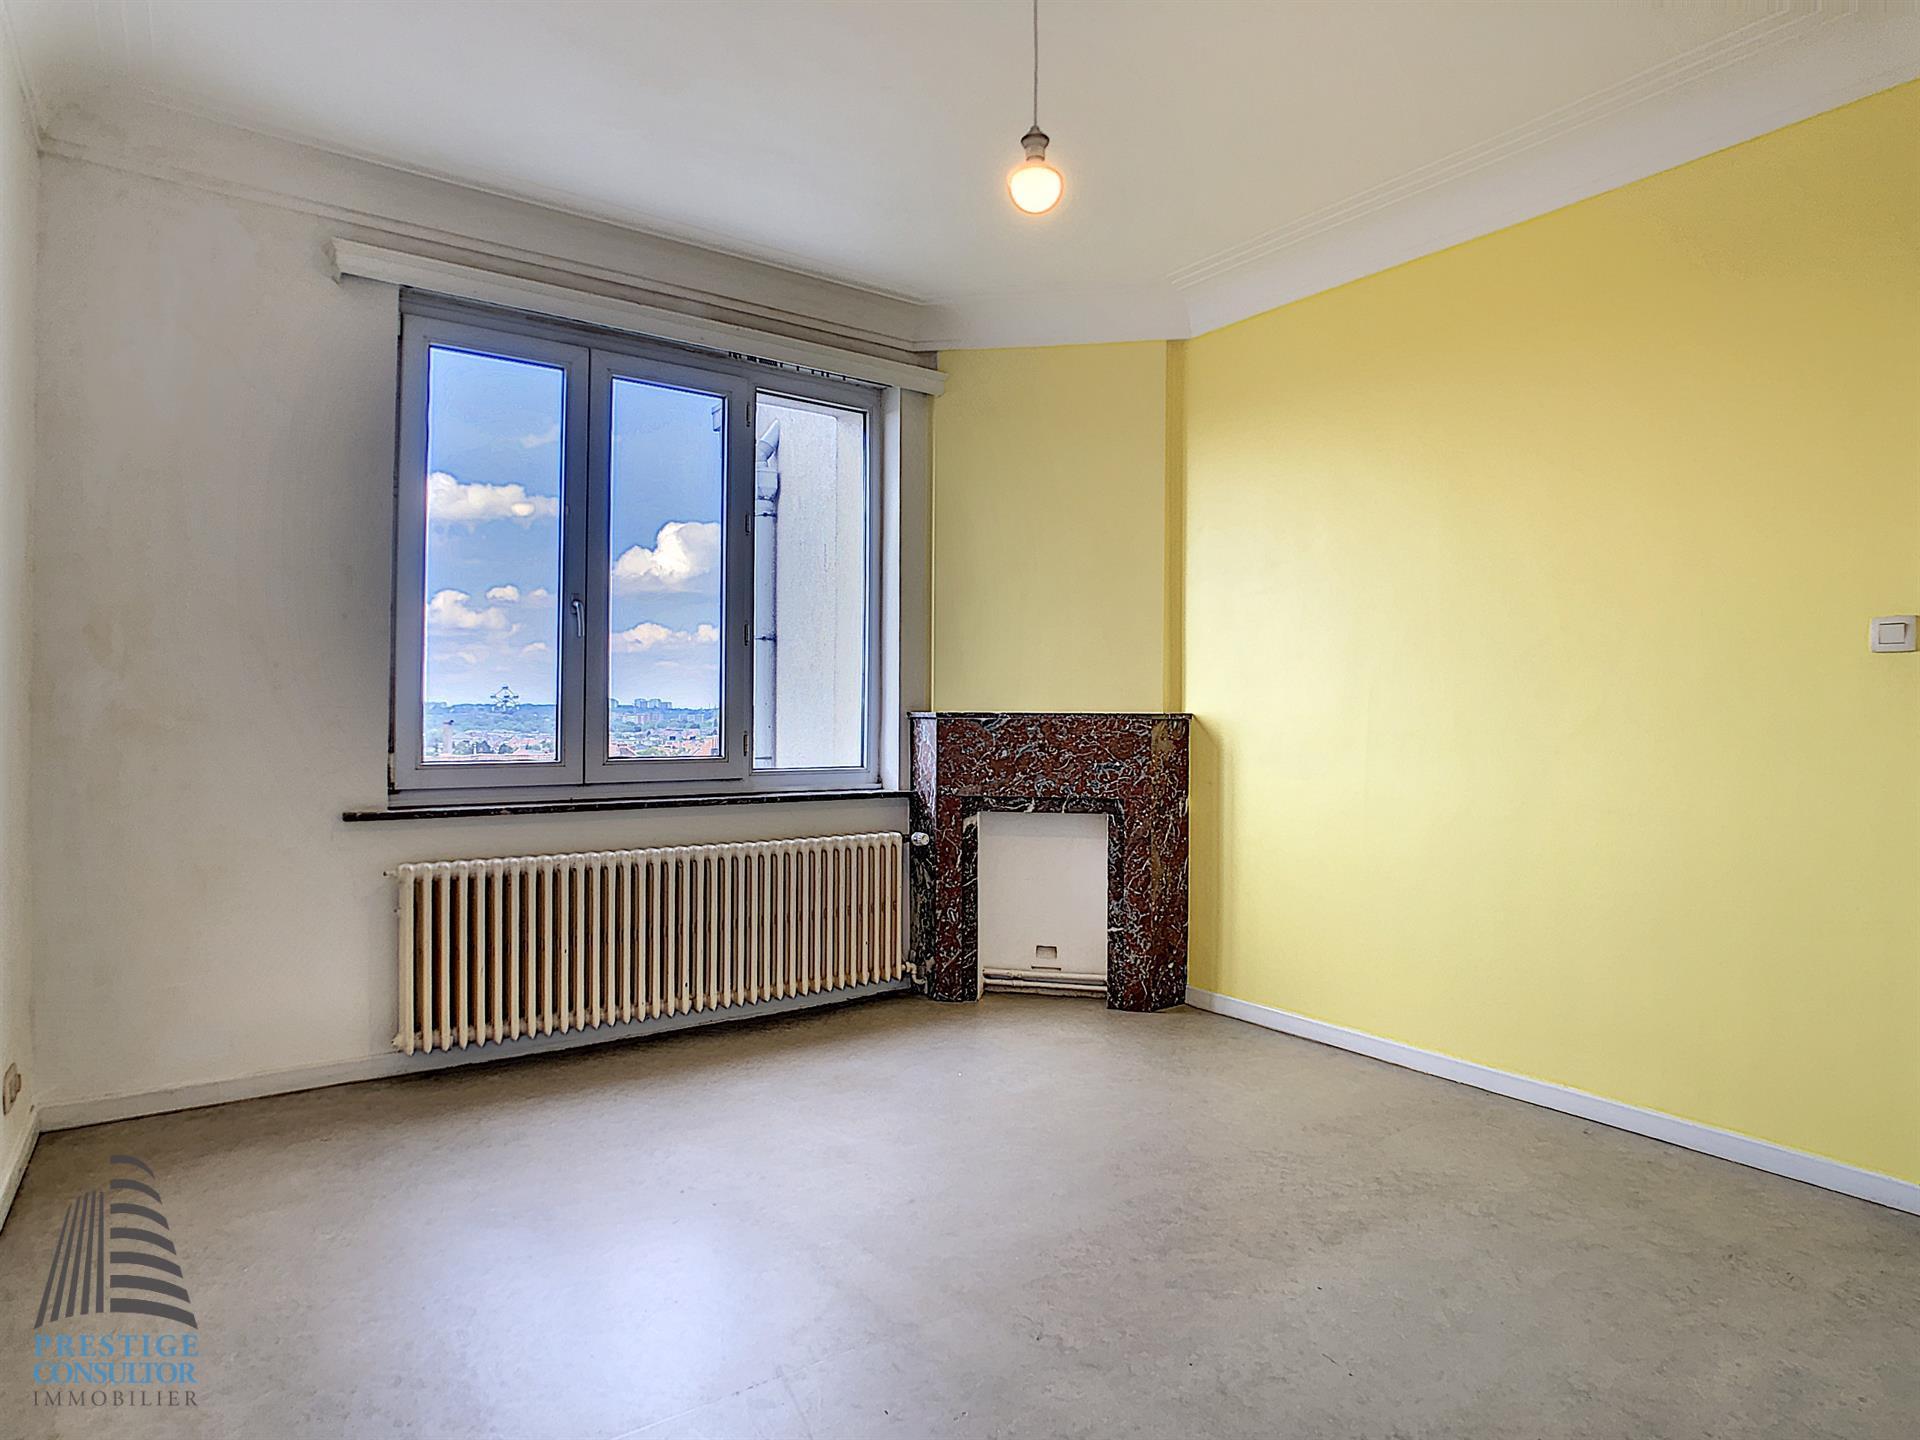 Appartement - Ganshoren - #4020002-13